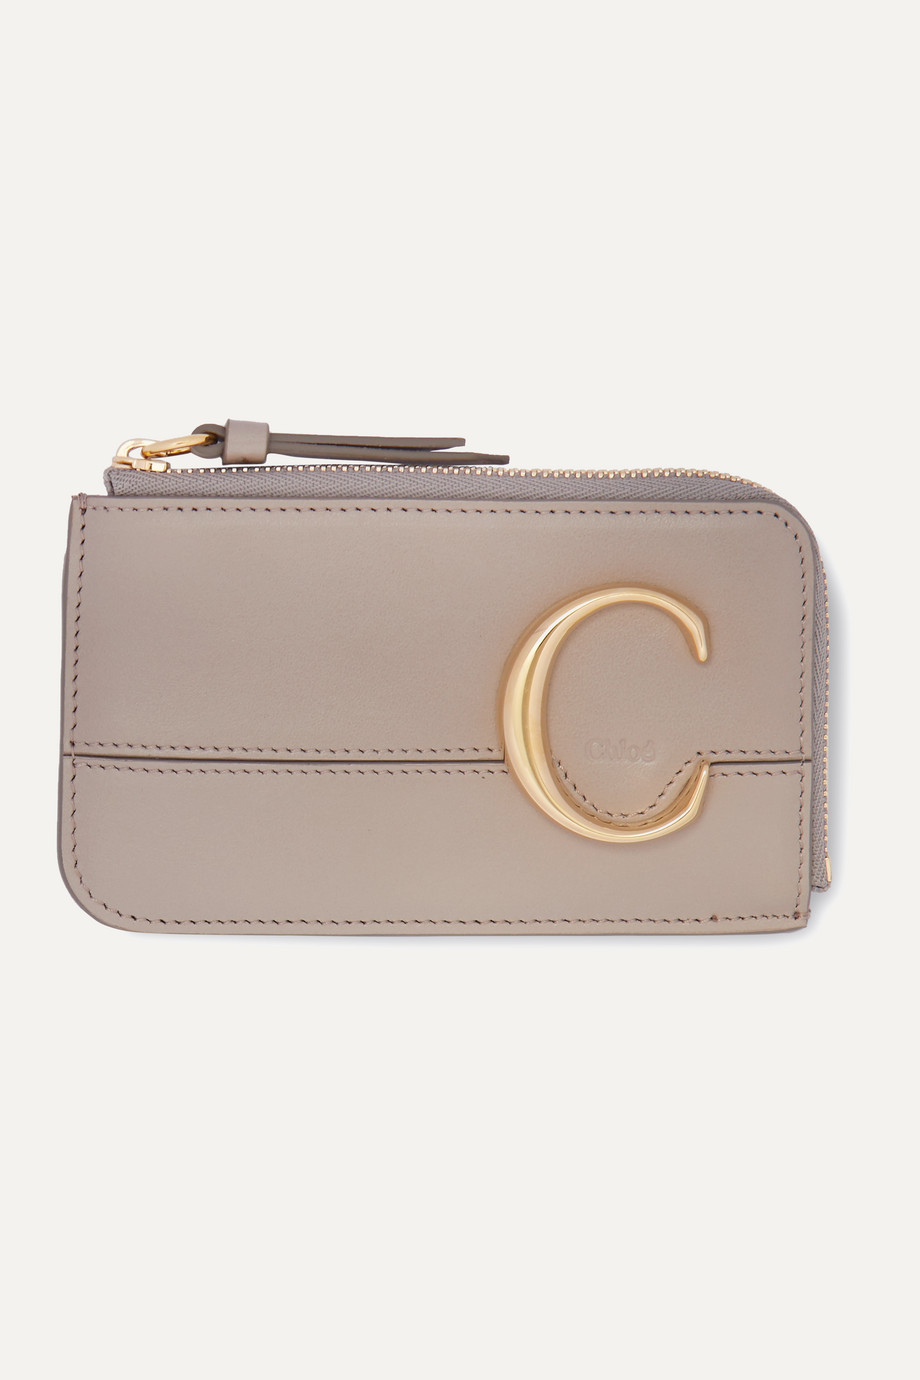 Chloé Porte-cartes en cuir Chloé C Small